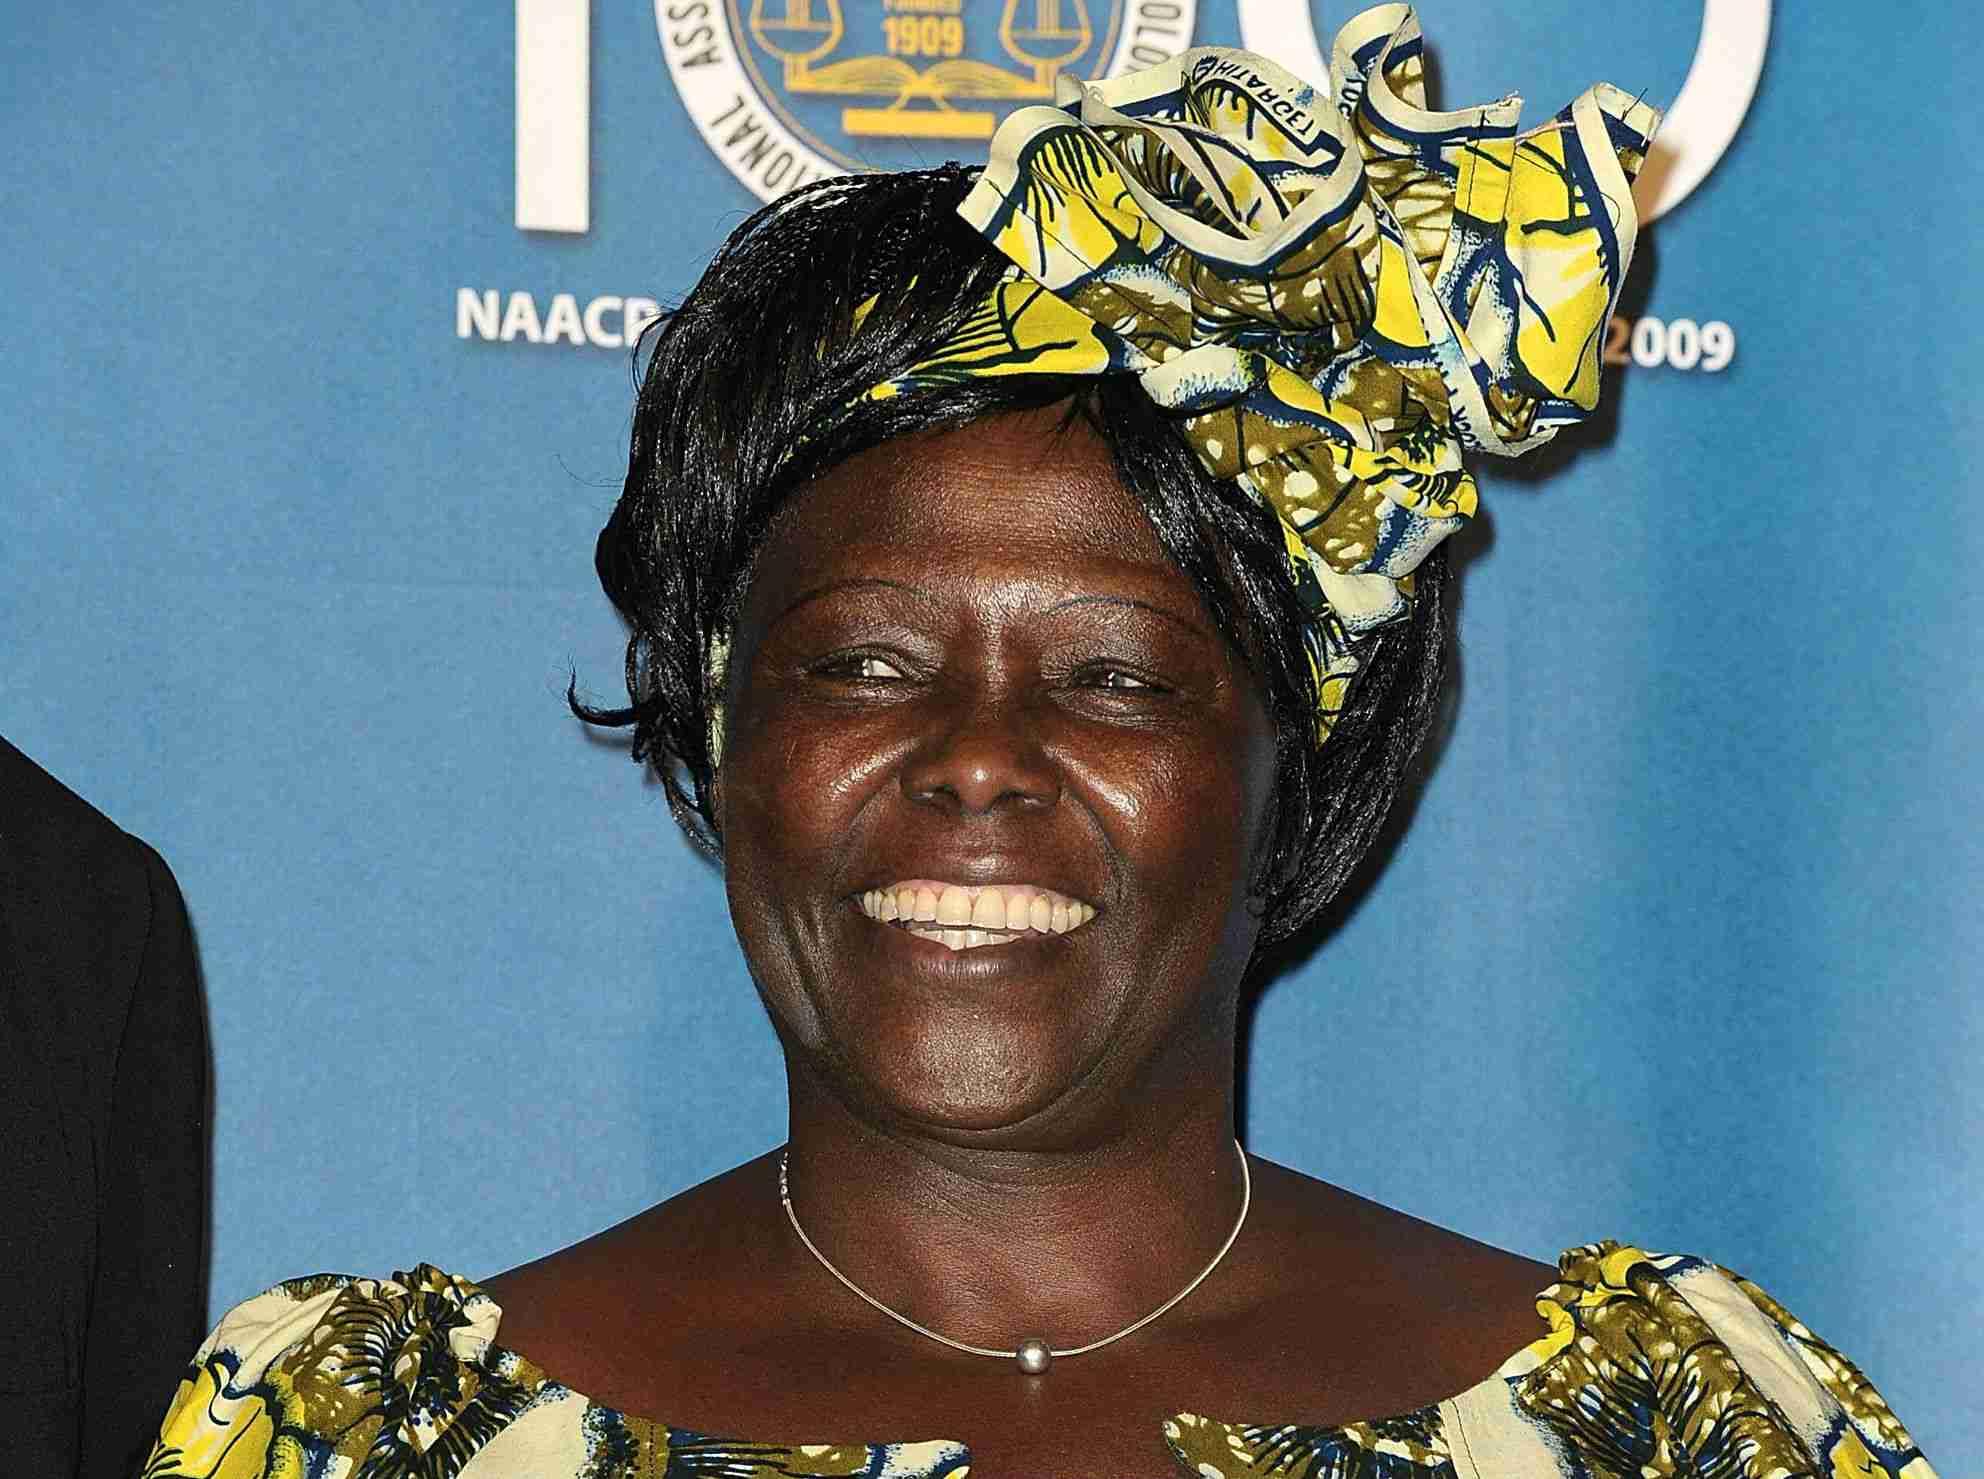 Wangari Maathai speaking